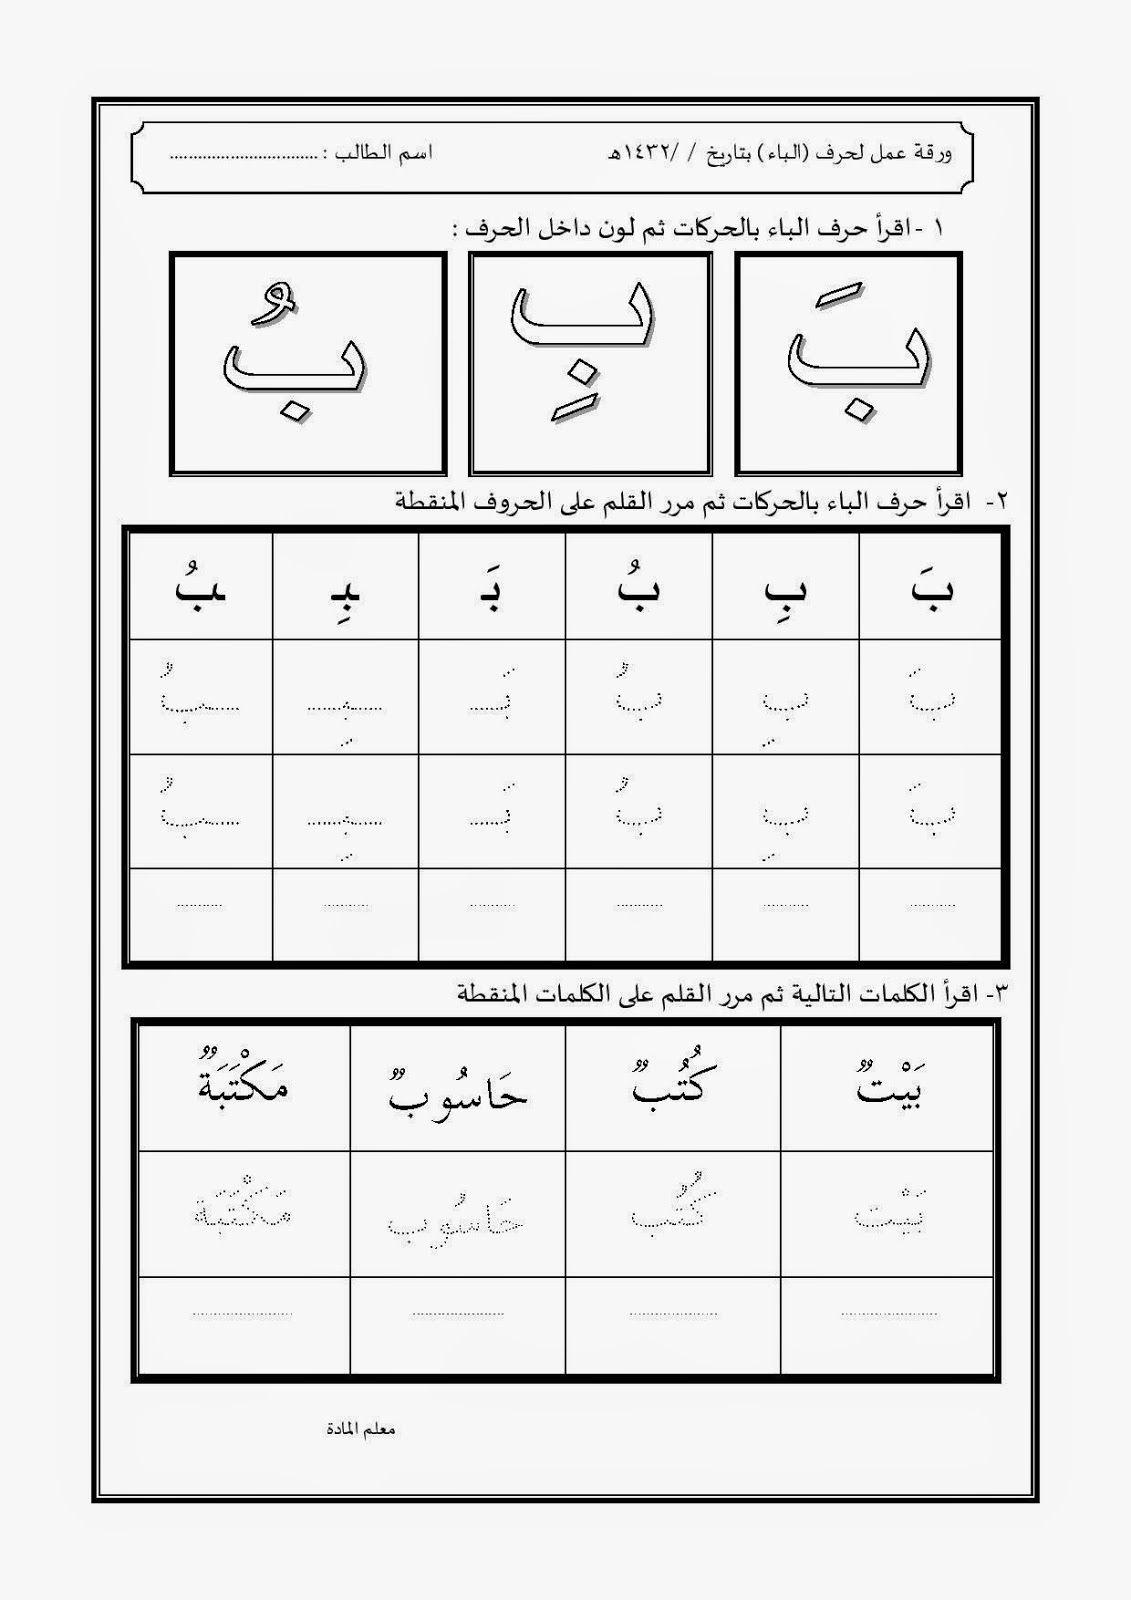 ورقه عمل جميع الحروف Page 002 Jpg 1 131 1 600 Pixels Learn Arabic Alphabet Arabic Worksheets Learning Arabic